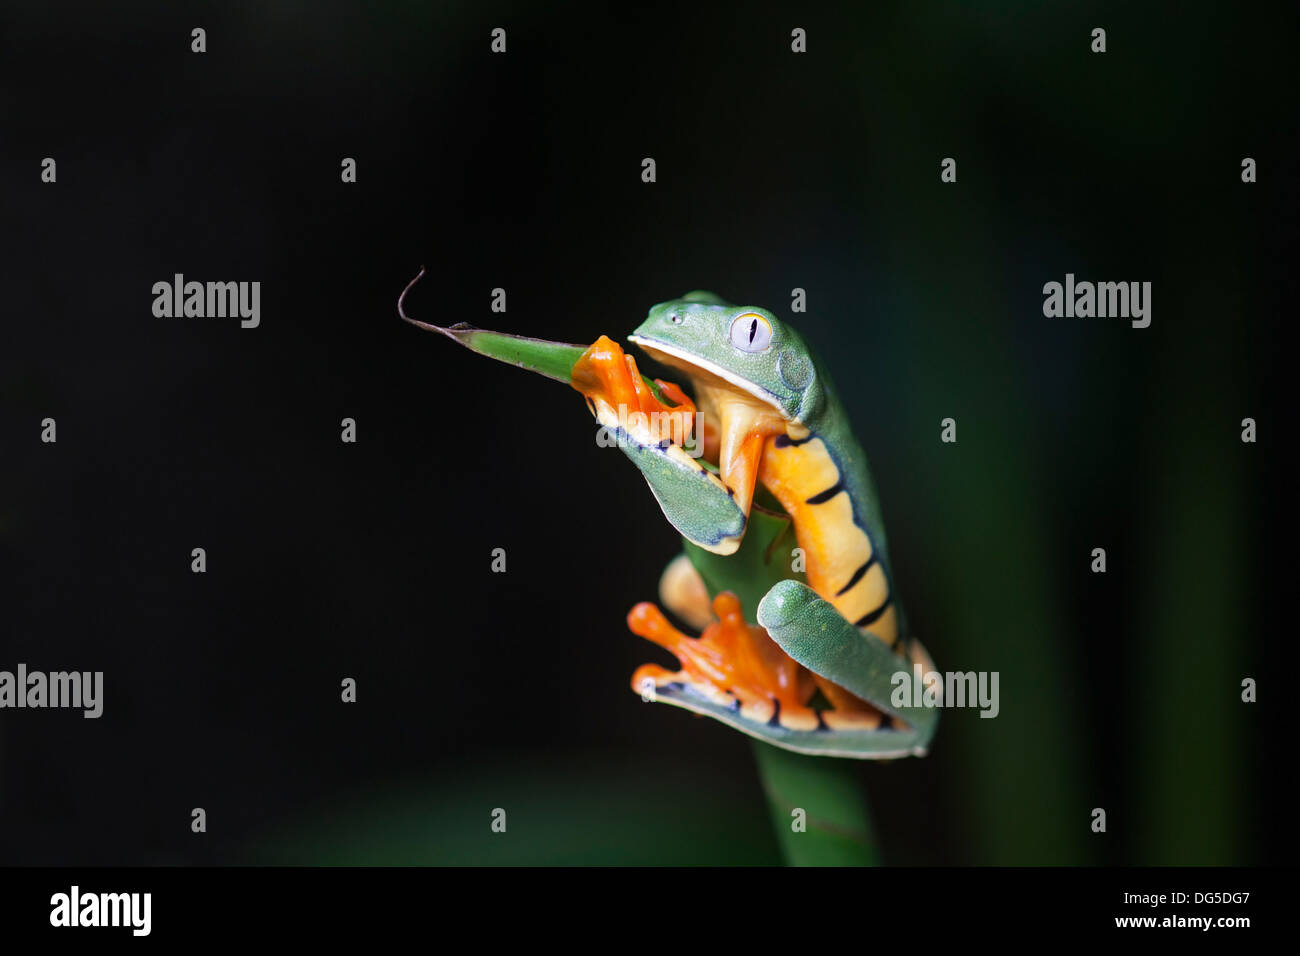 Golden-eyed Leaf Frog (Cruziohyla calcarifer) clinging to plant stem - Stock Image